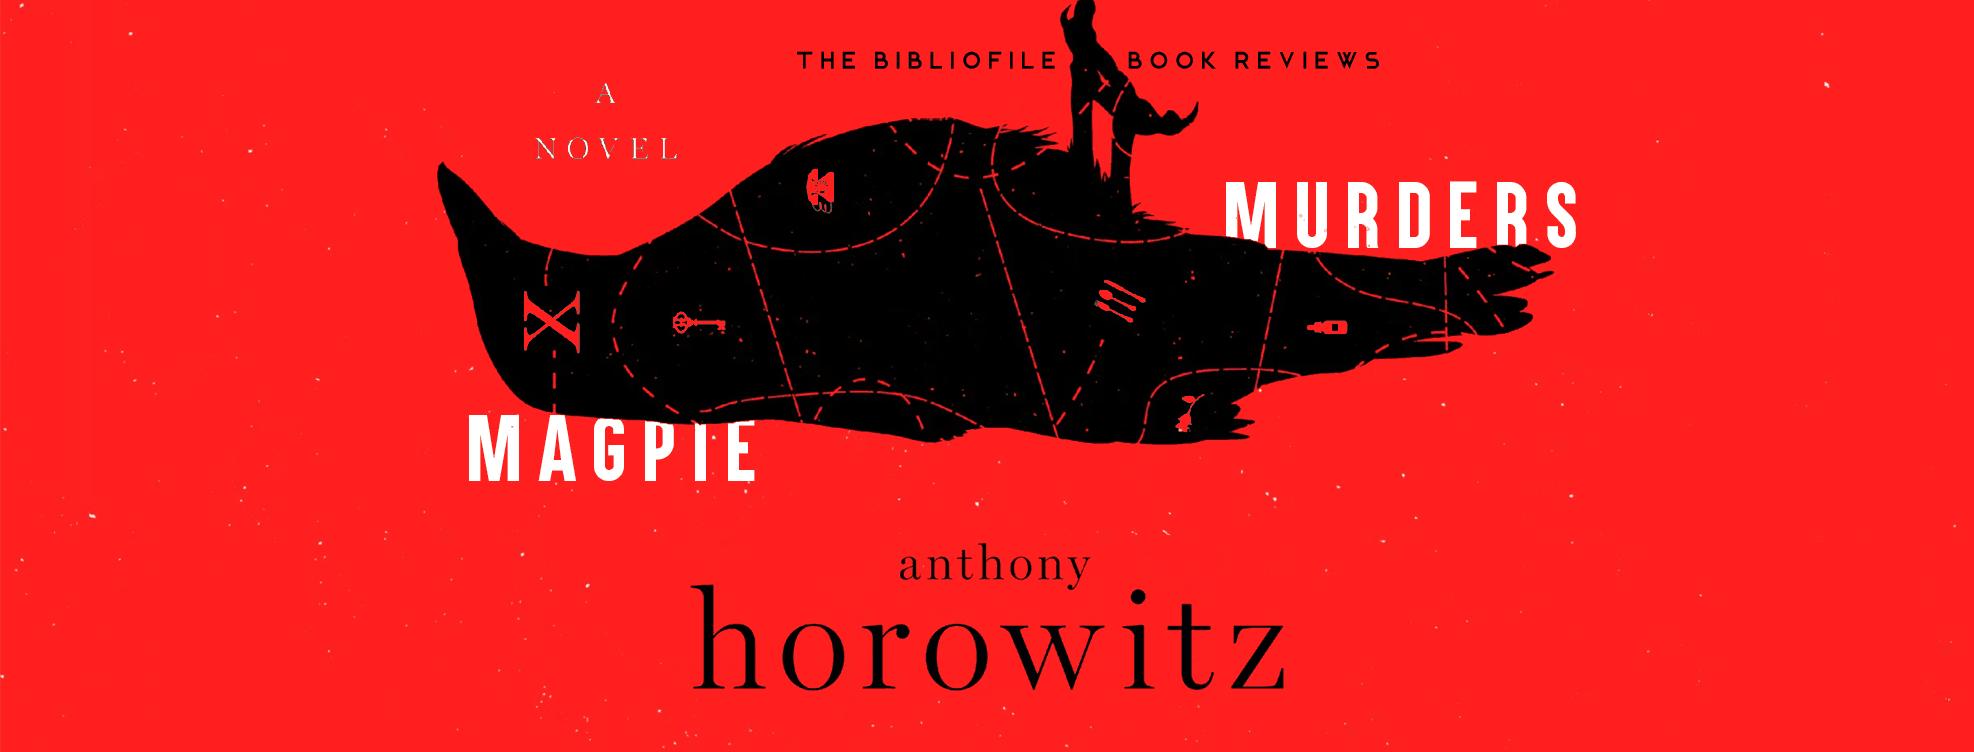 magpie murders horowtz